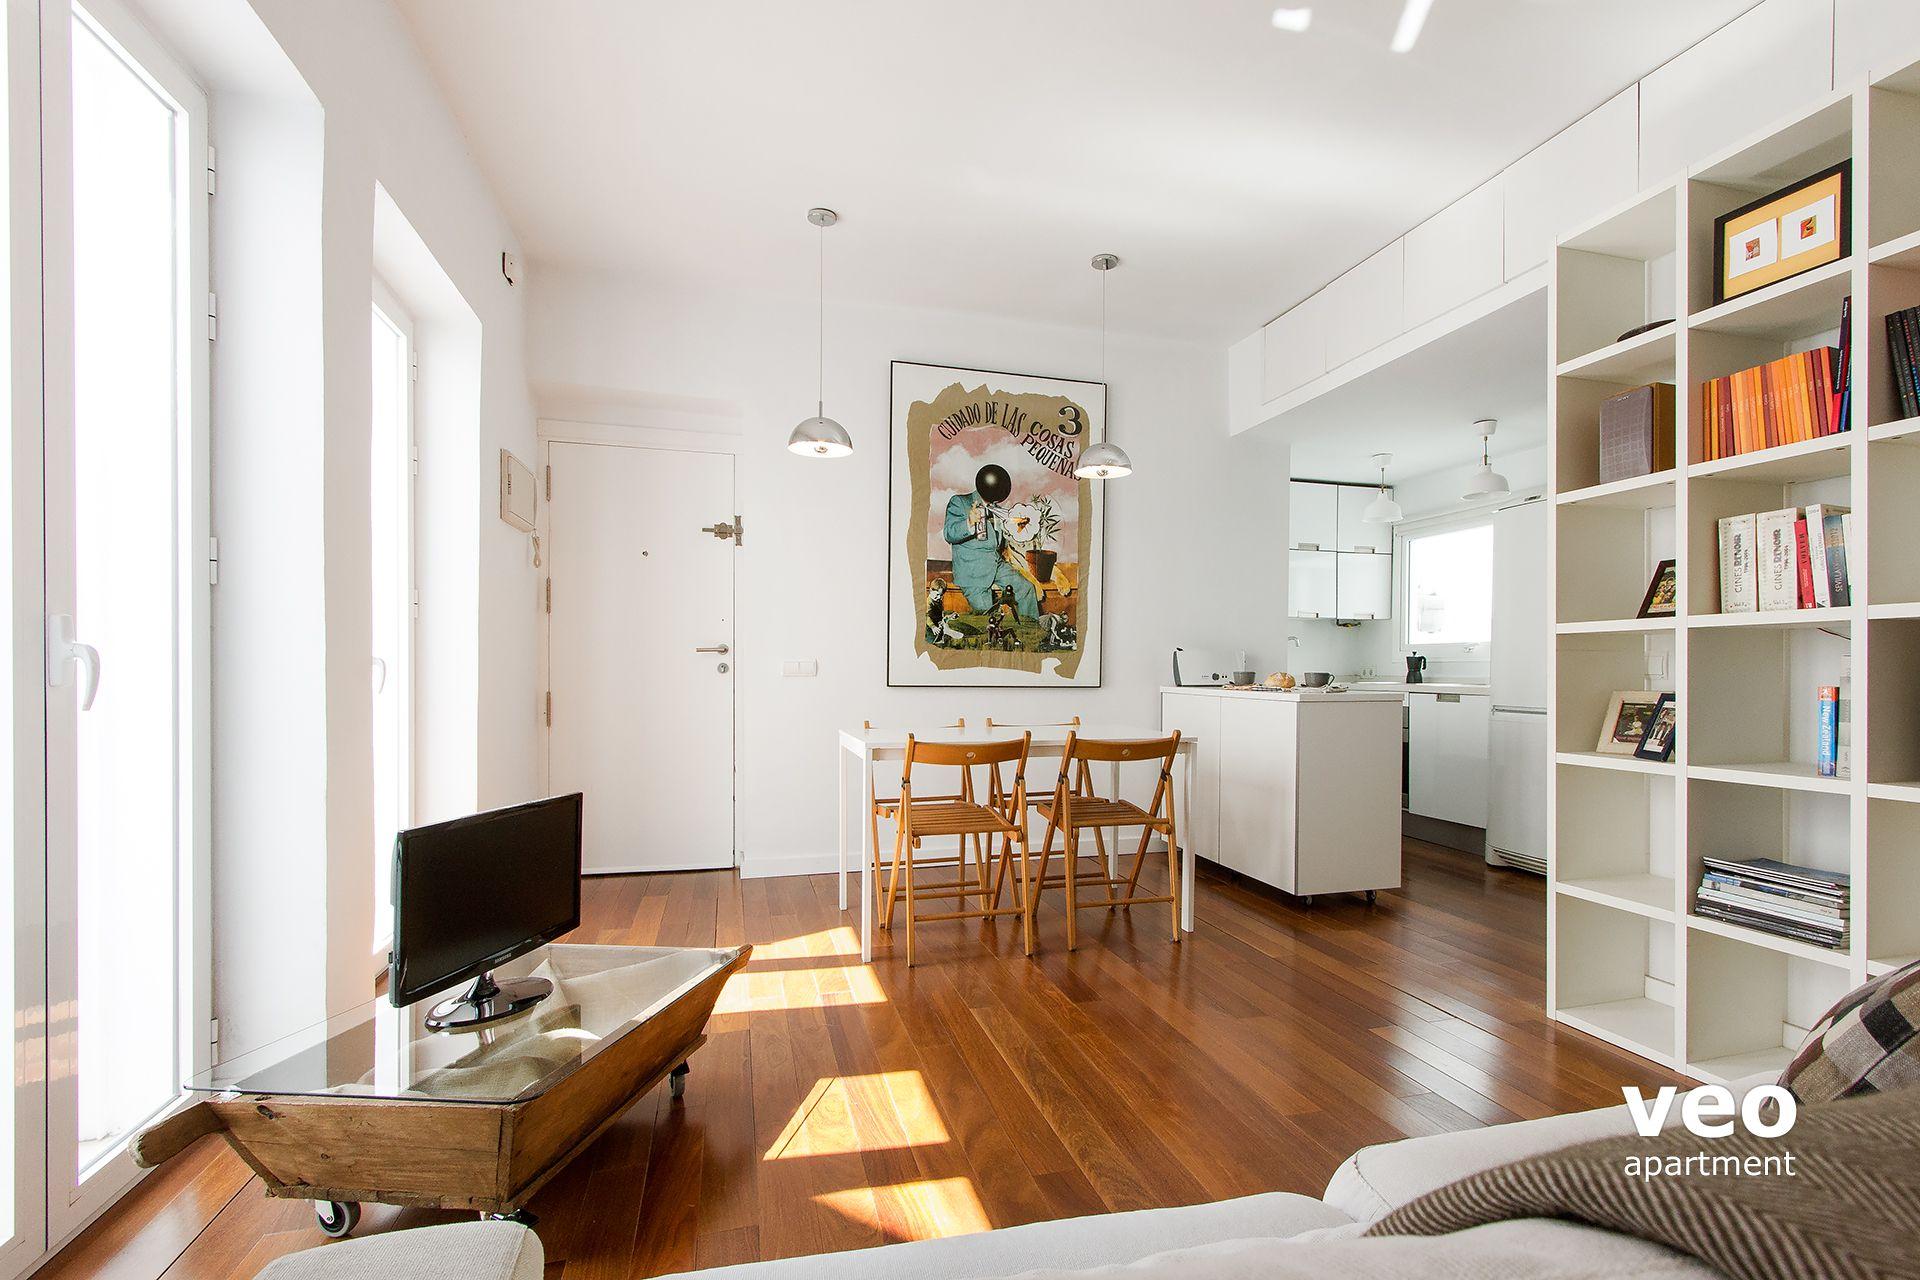 Sevilla apartmento calle duque cornejo sevilla espa a for Registro bienes muebles sevilla